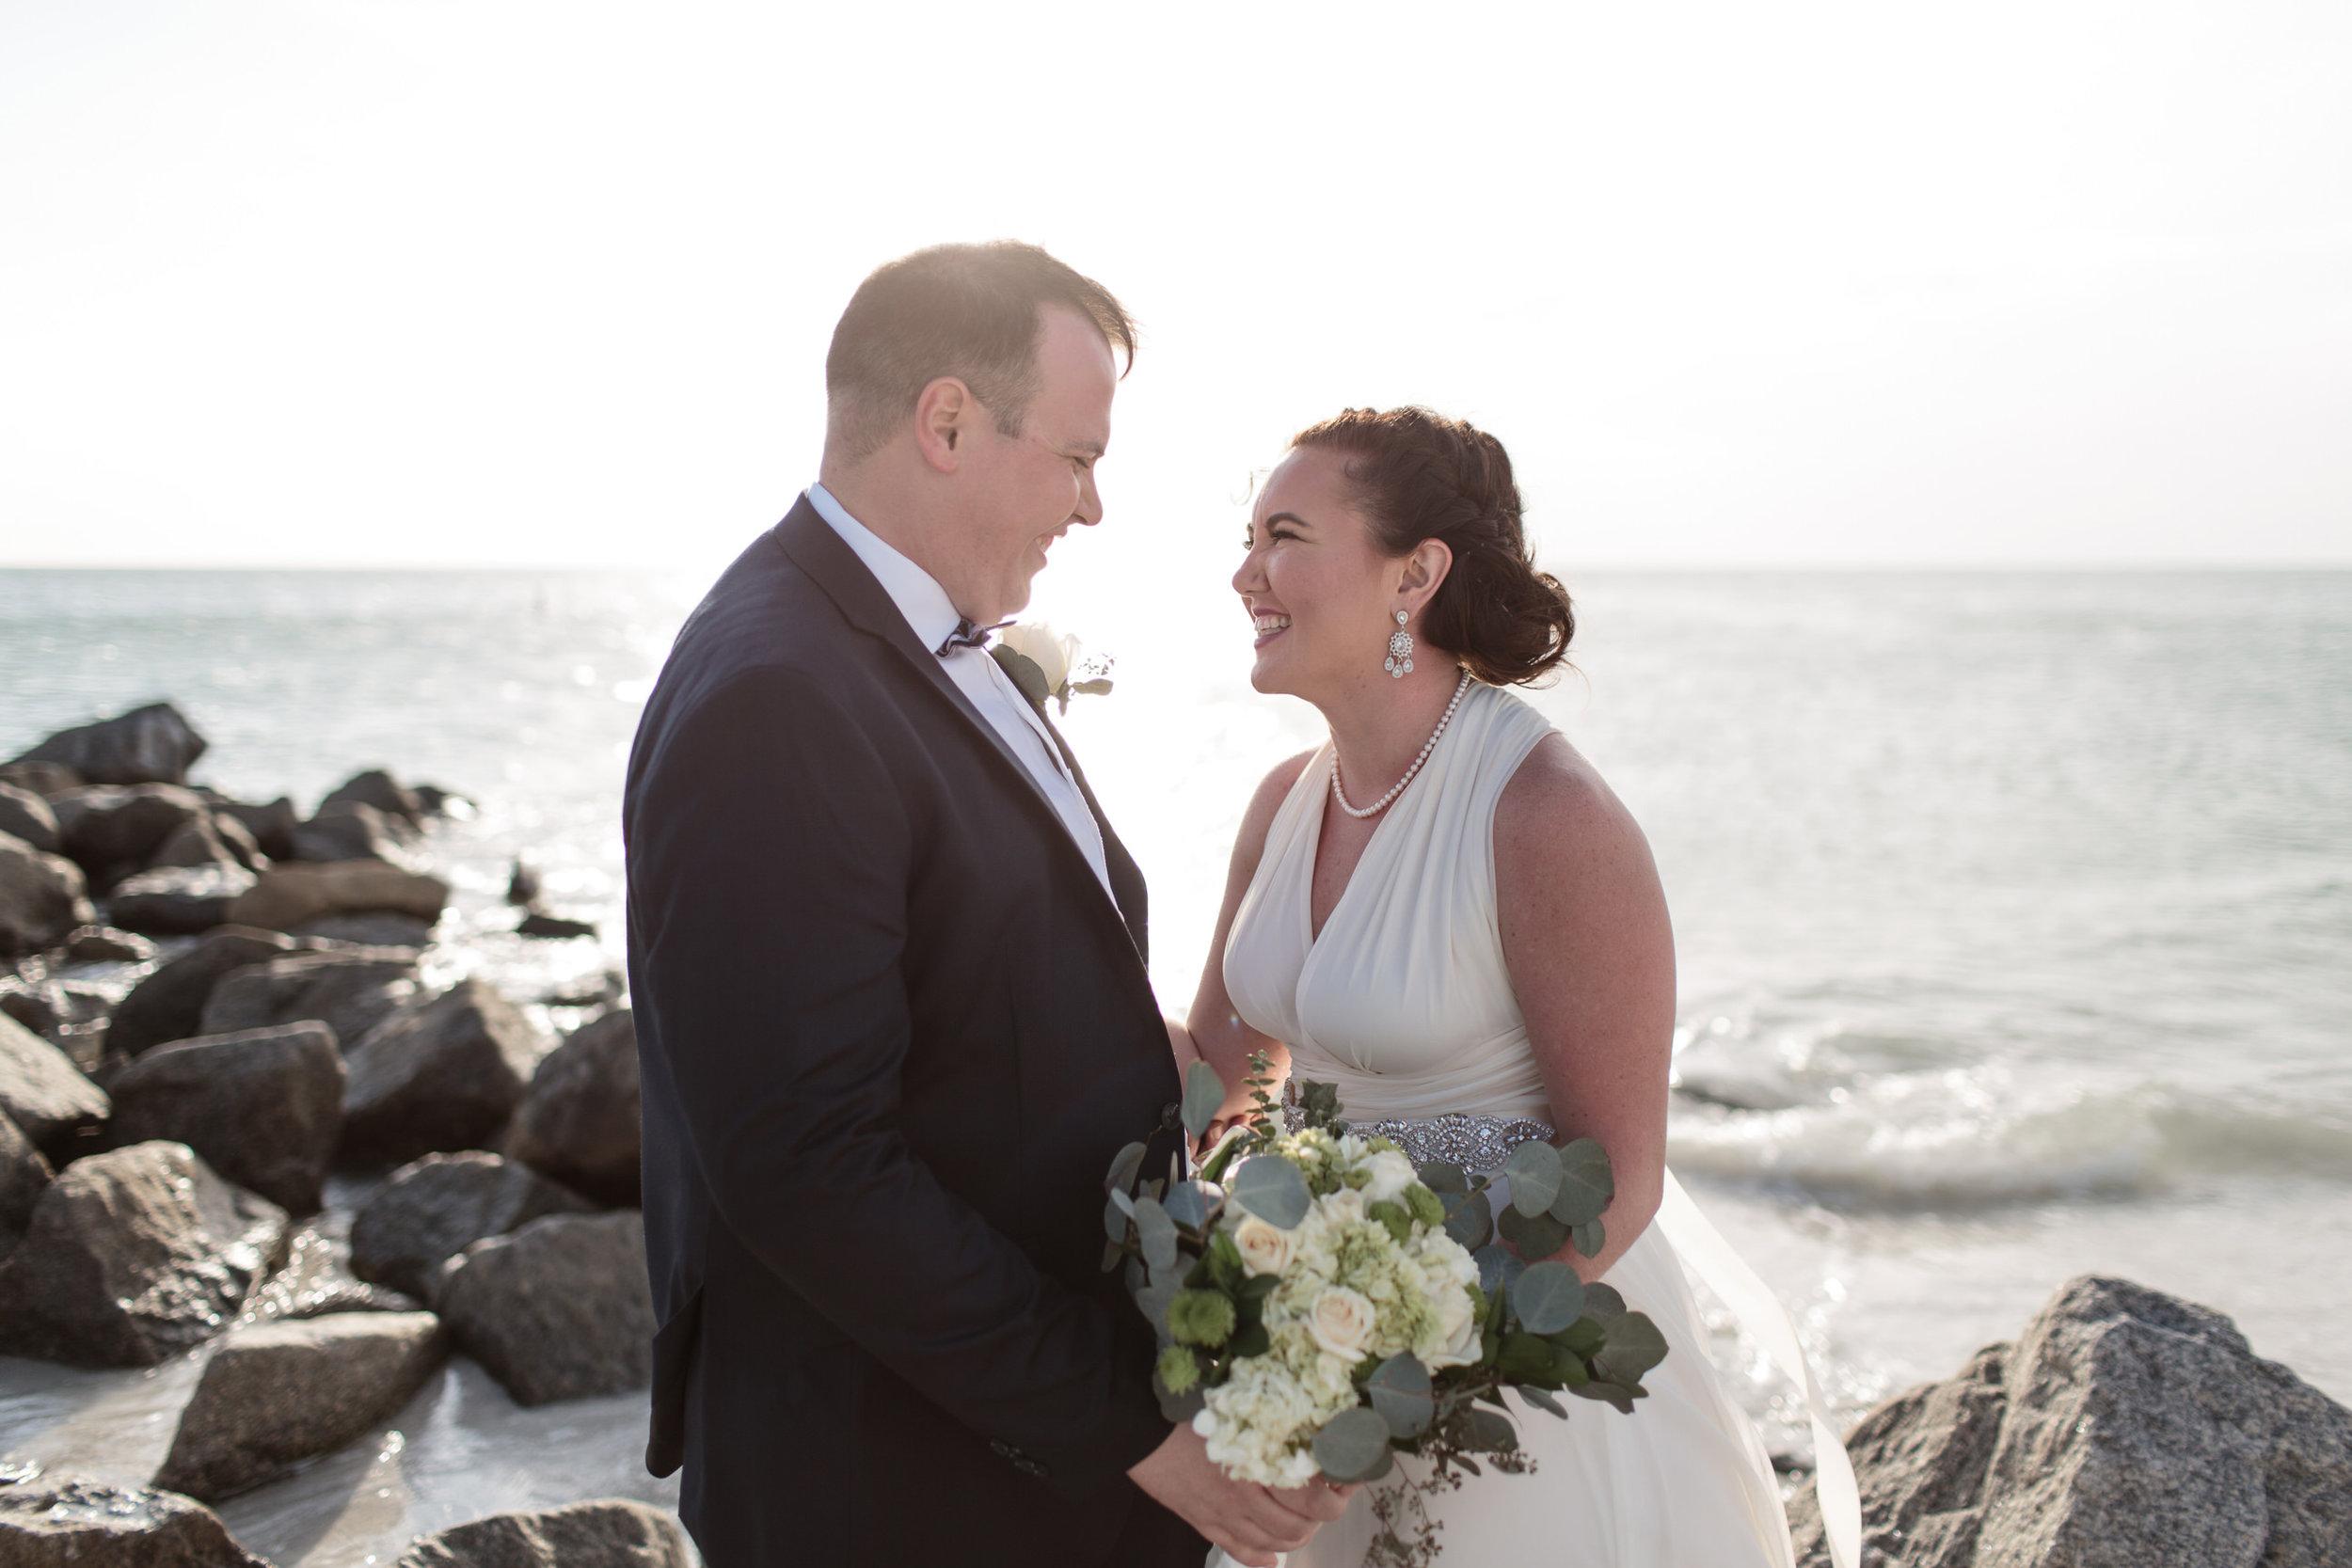 Beltran_Treasure_Island_Elopement_Tampa_Wedding_053-1.jpg